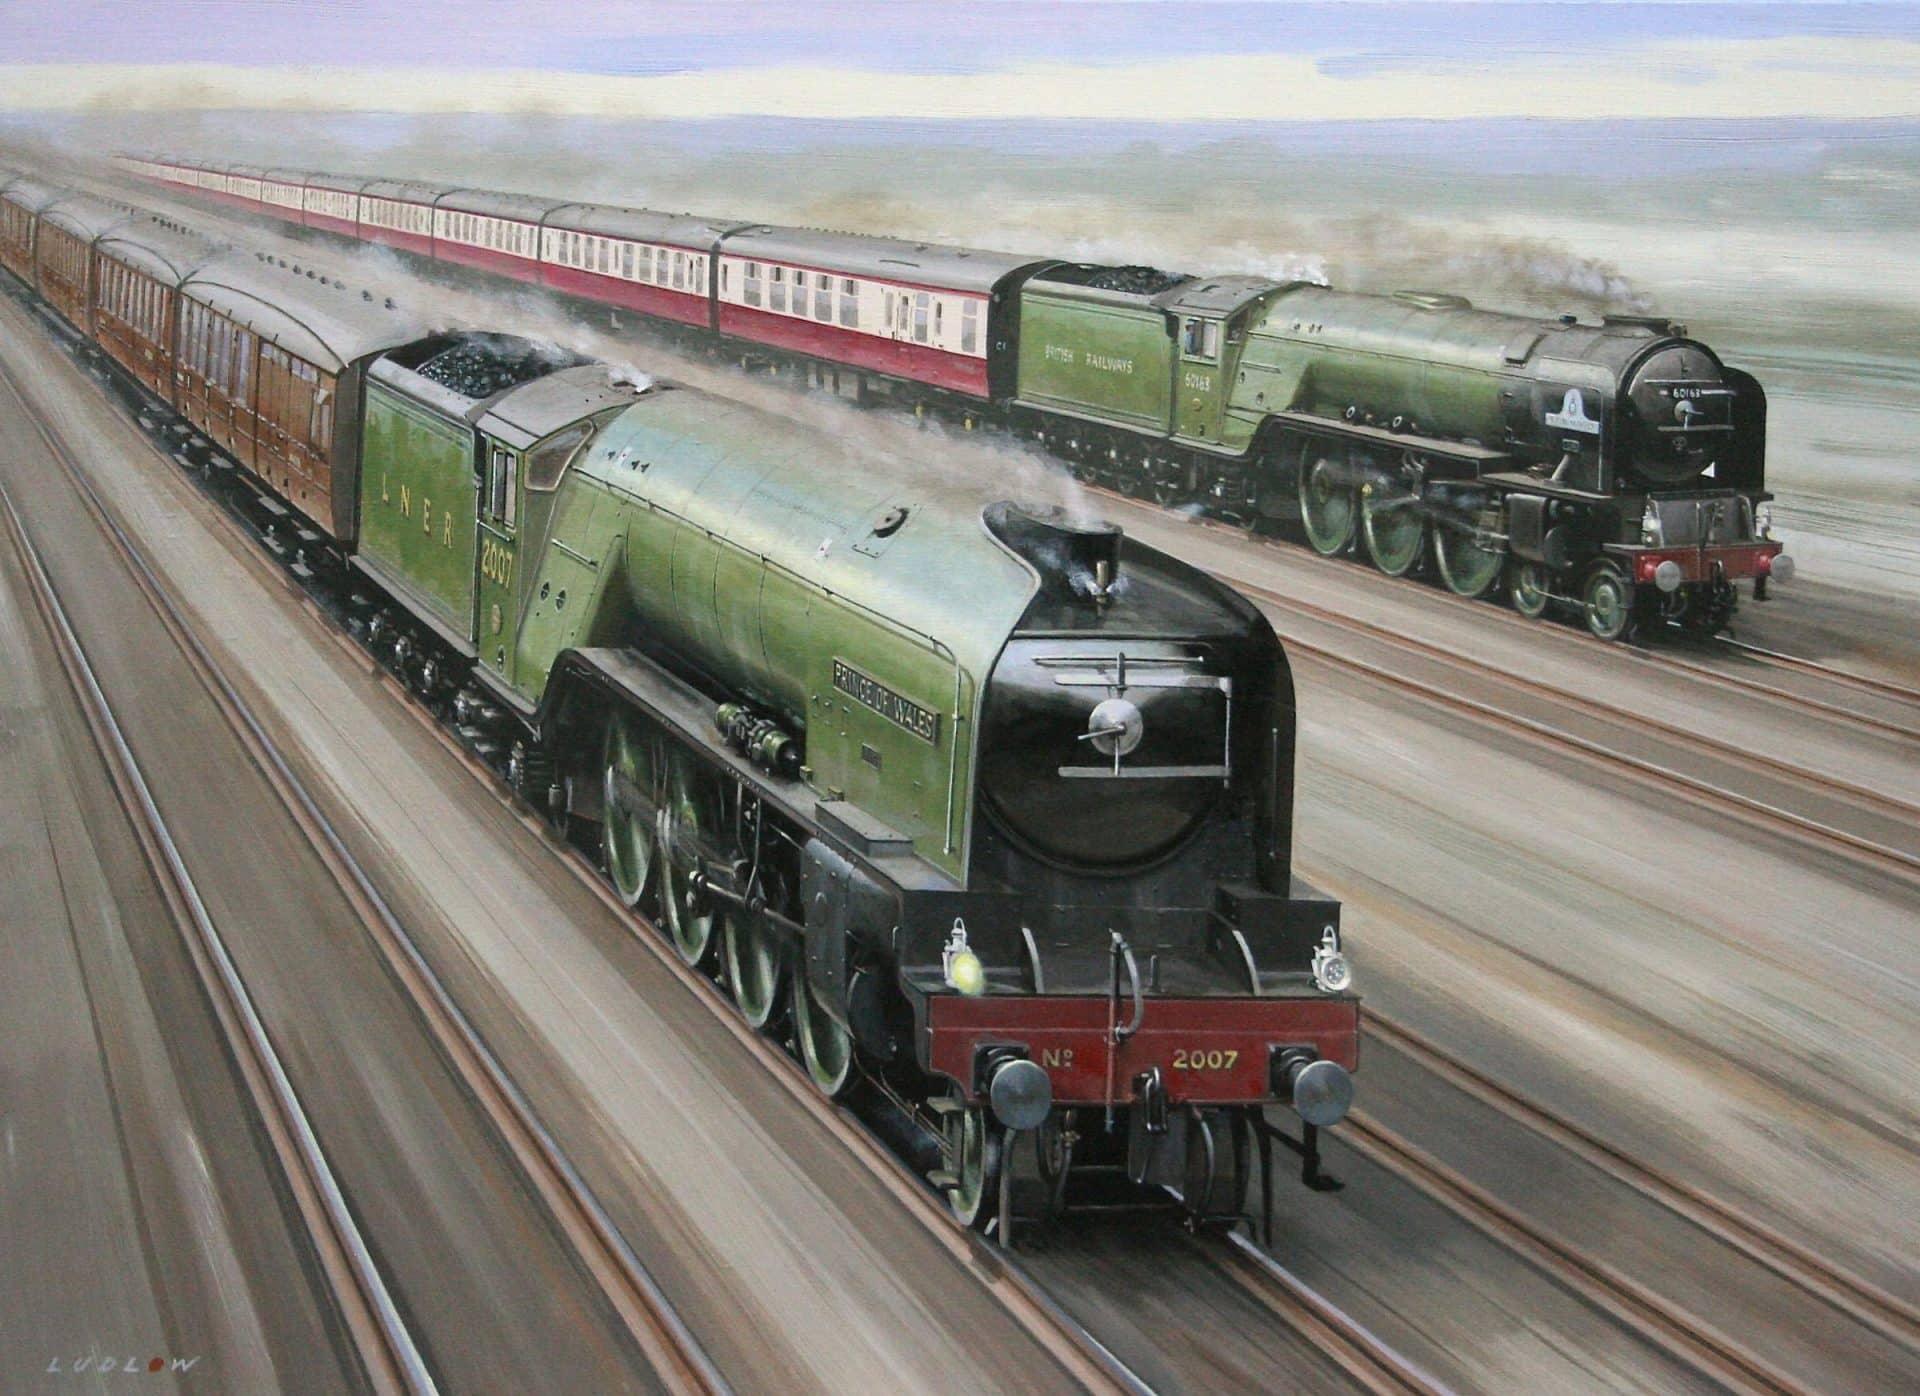 2007 Prince of Wales and 60163 Tornado